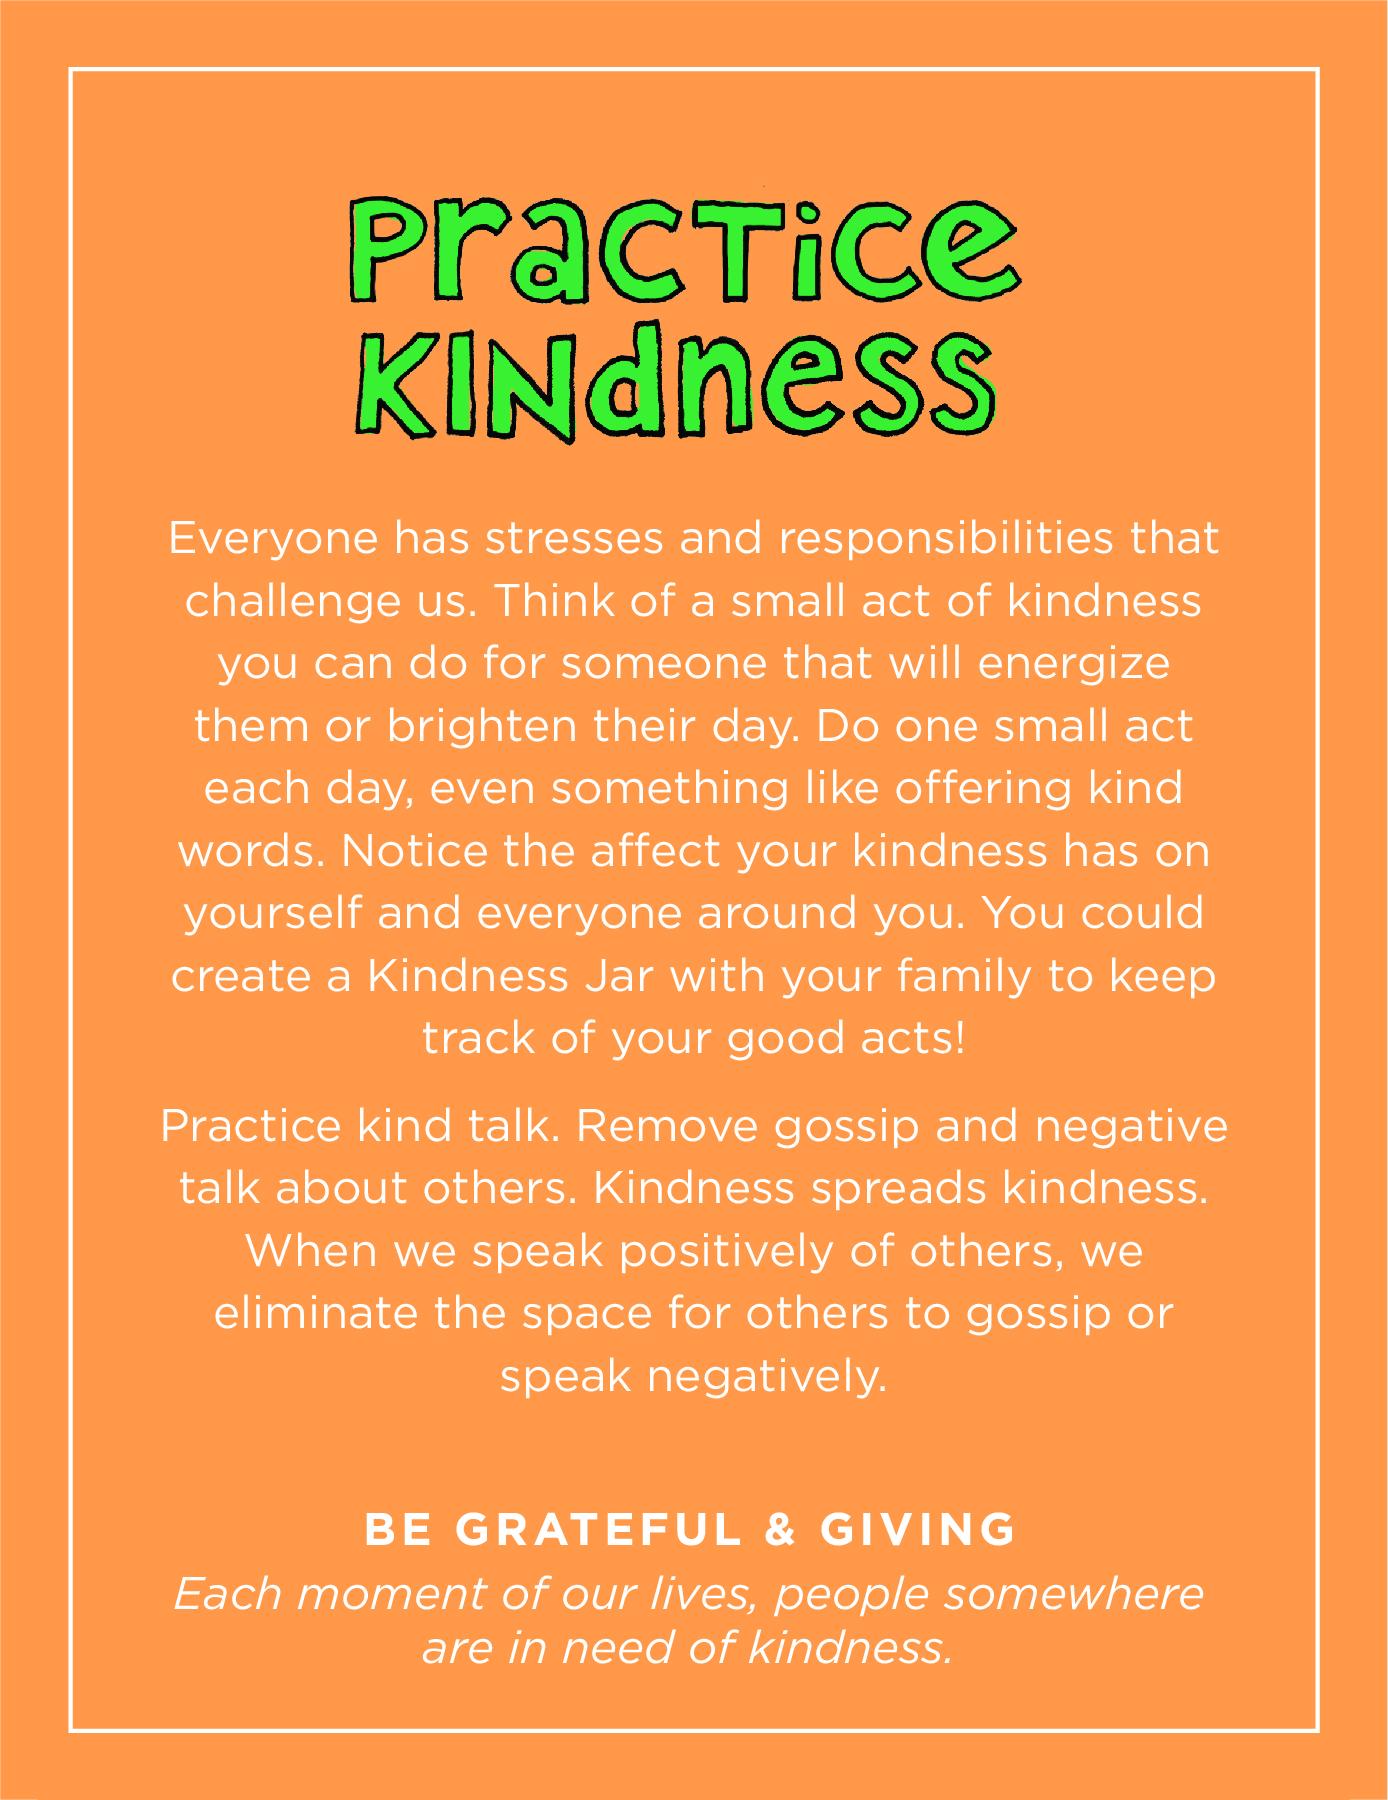 Practice kindness